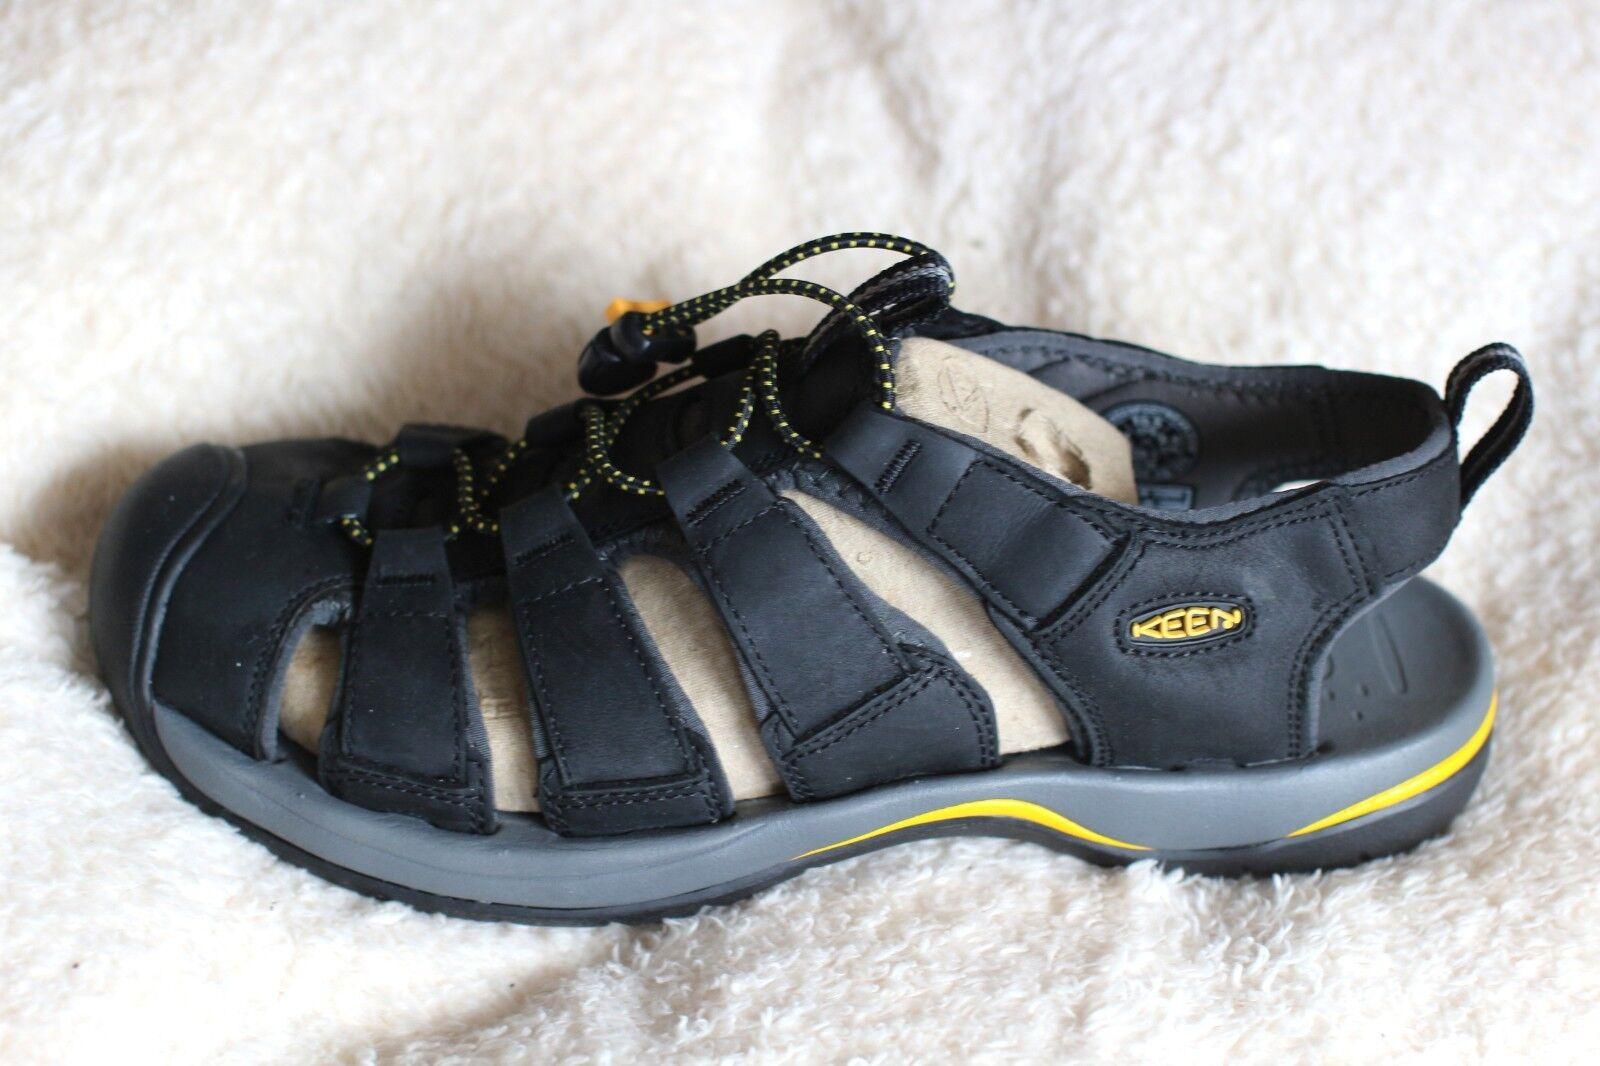 Keen outdoor Sandale    Kreek Gr. 47 (Bitte Lesen) 118349